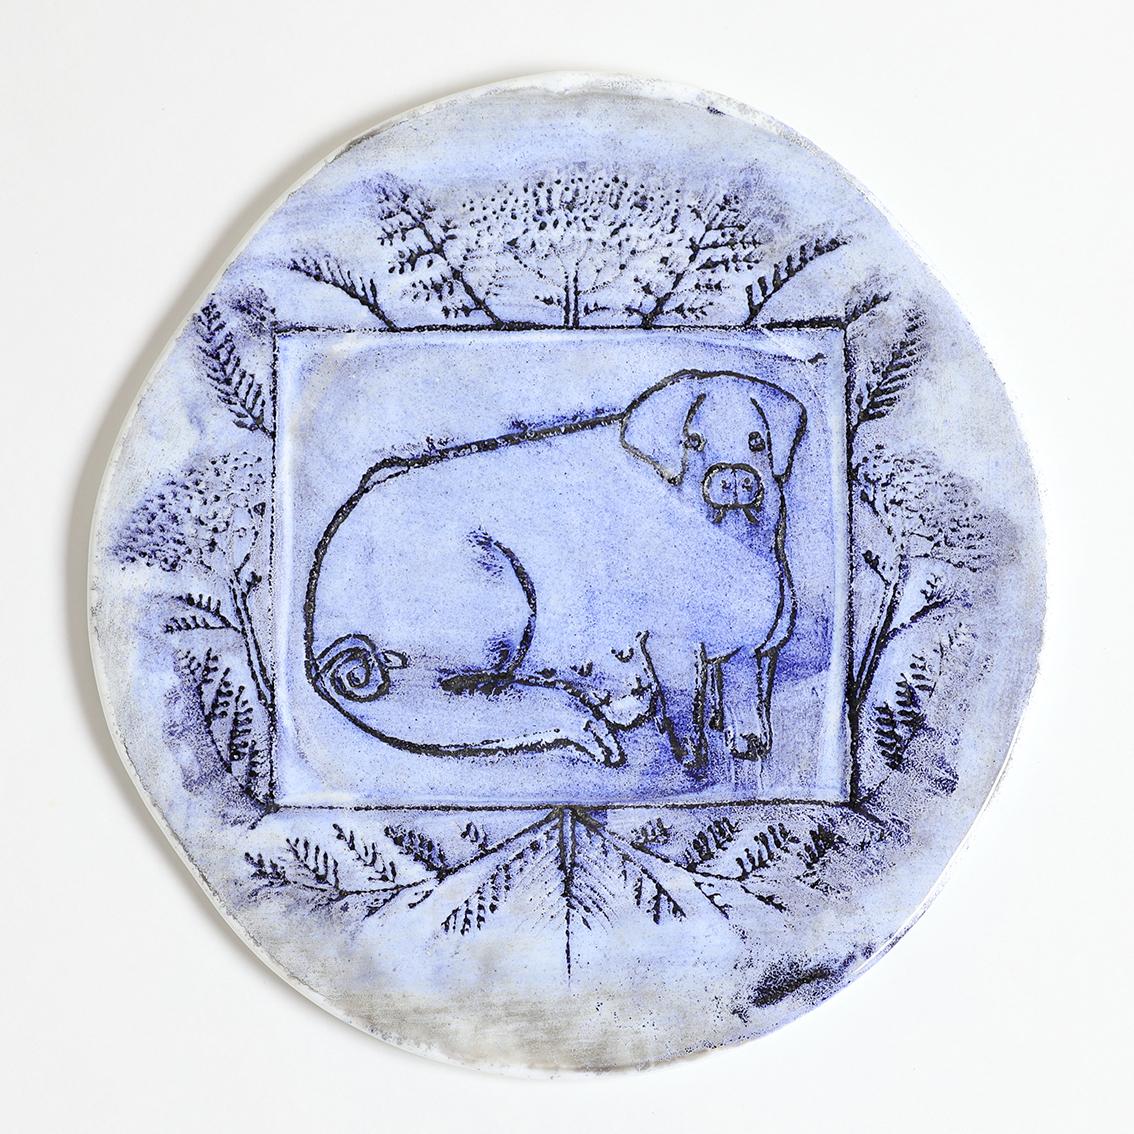 Nuutajarvi ヌータヤルビ Oiva Toikka オイバ トイッカ 豚の陶板 北欧ヴィンテージ